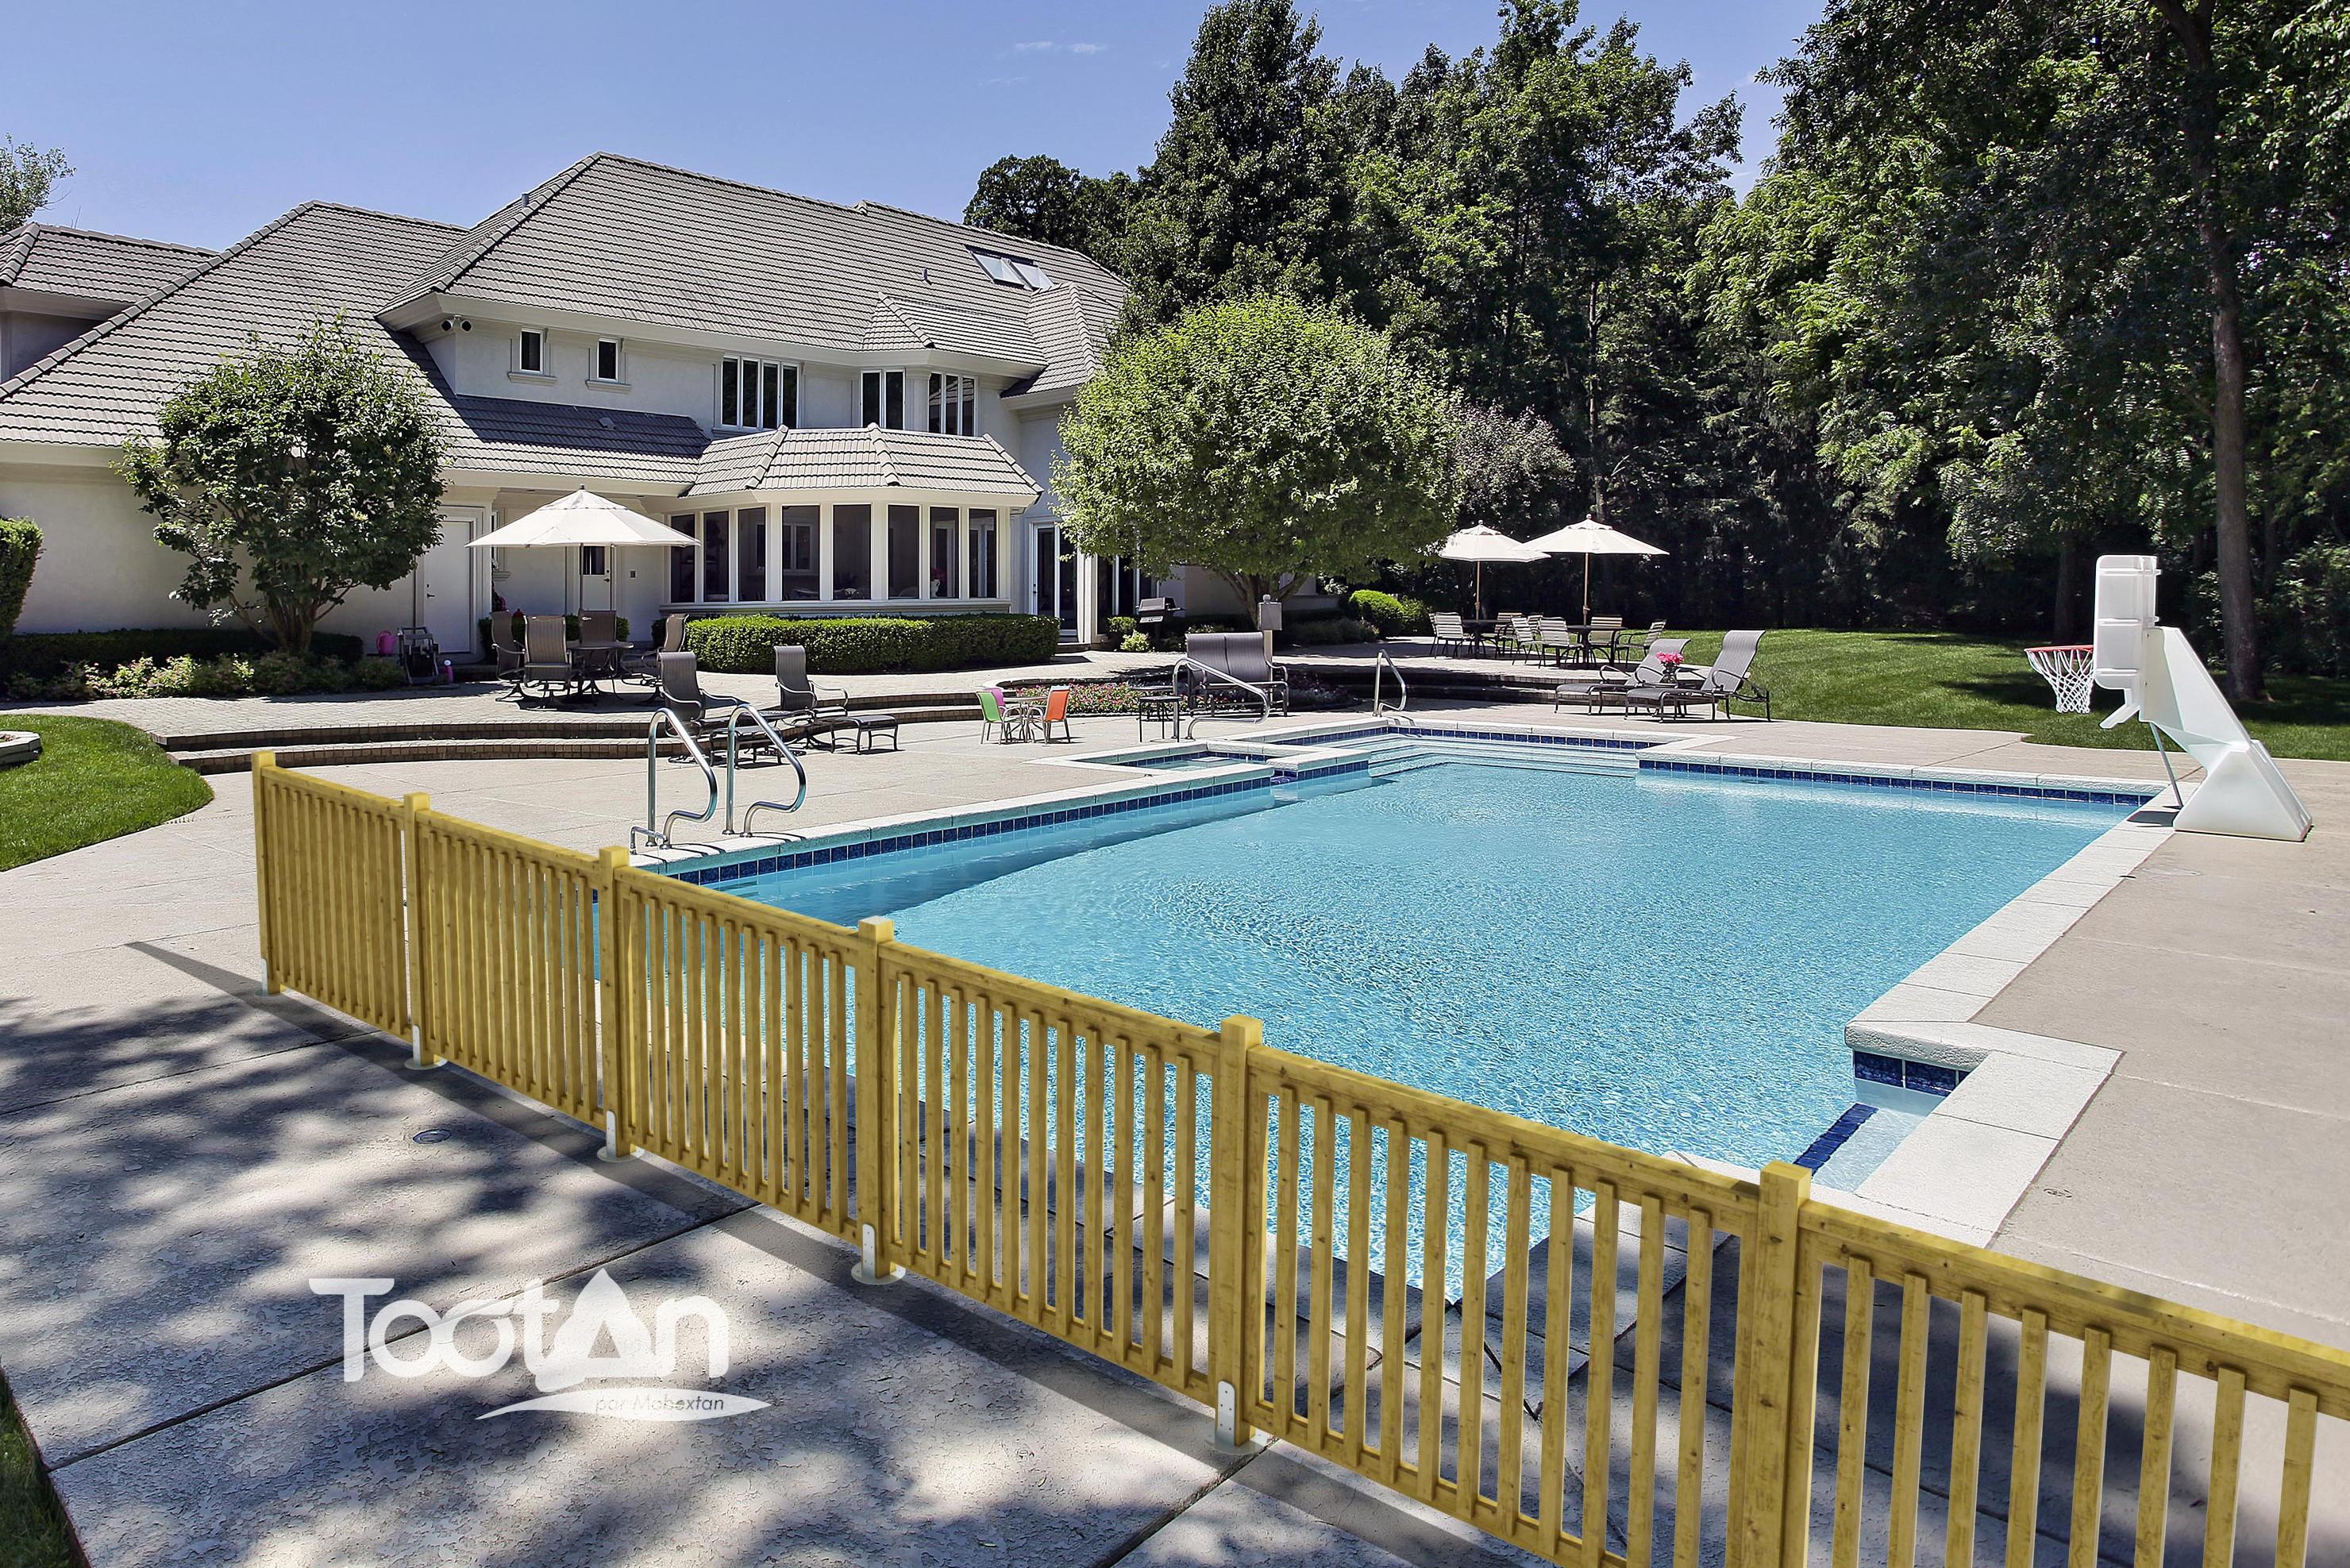 mobilier piscine magasin confort jardin with mobilier piscine top outdoor amnagement avec un. Black Bedroom Furniture Sets. Home Design Ideas